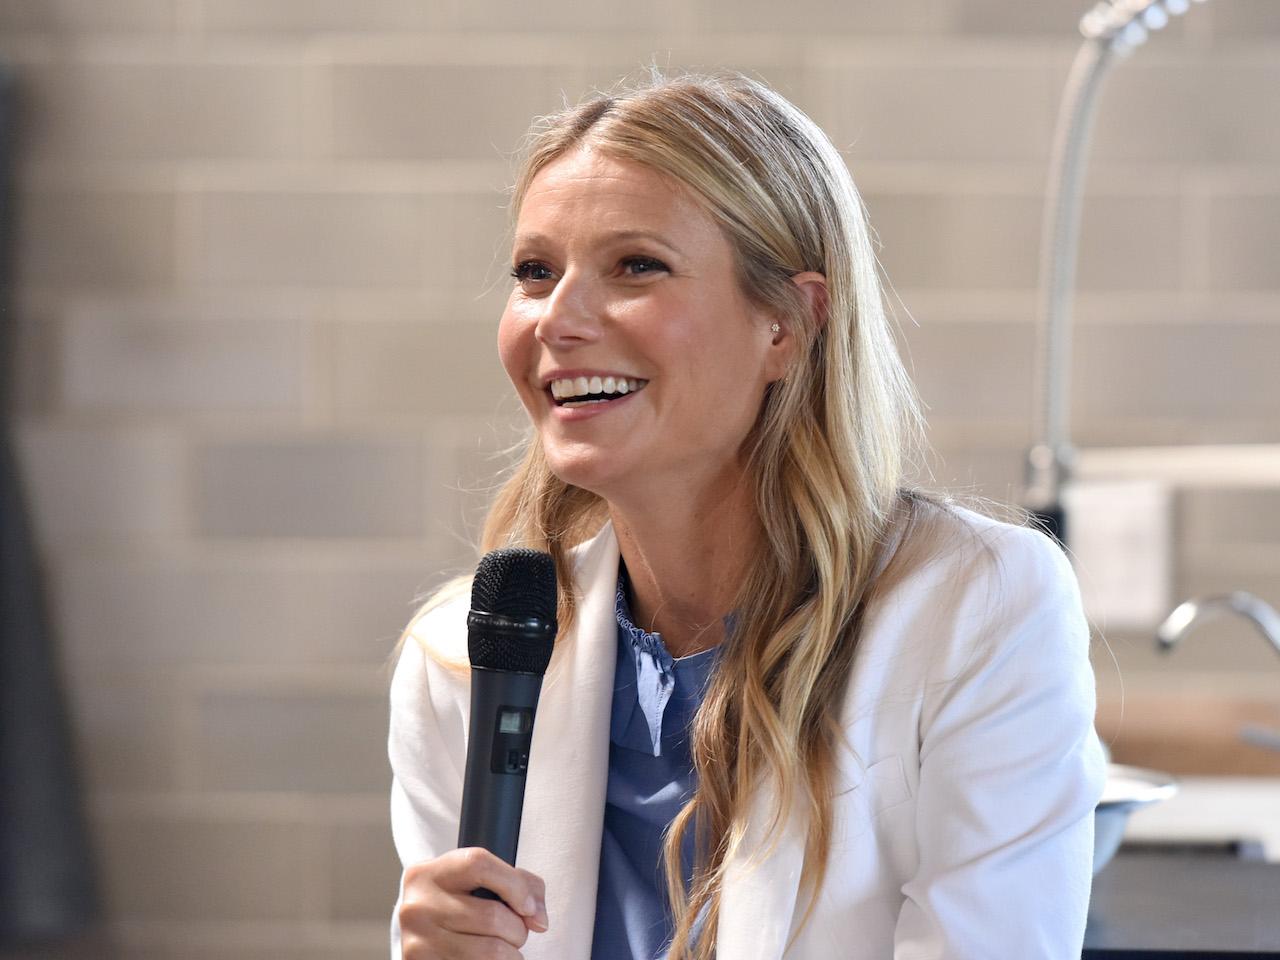 gwyneth paltrow launched the goop podcast: photo of gwyneth paltrow